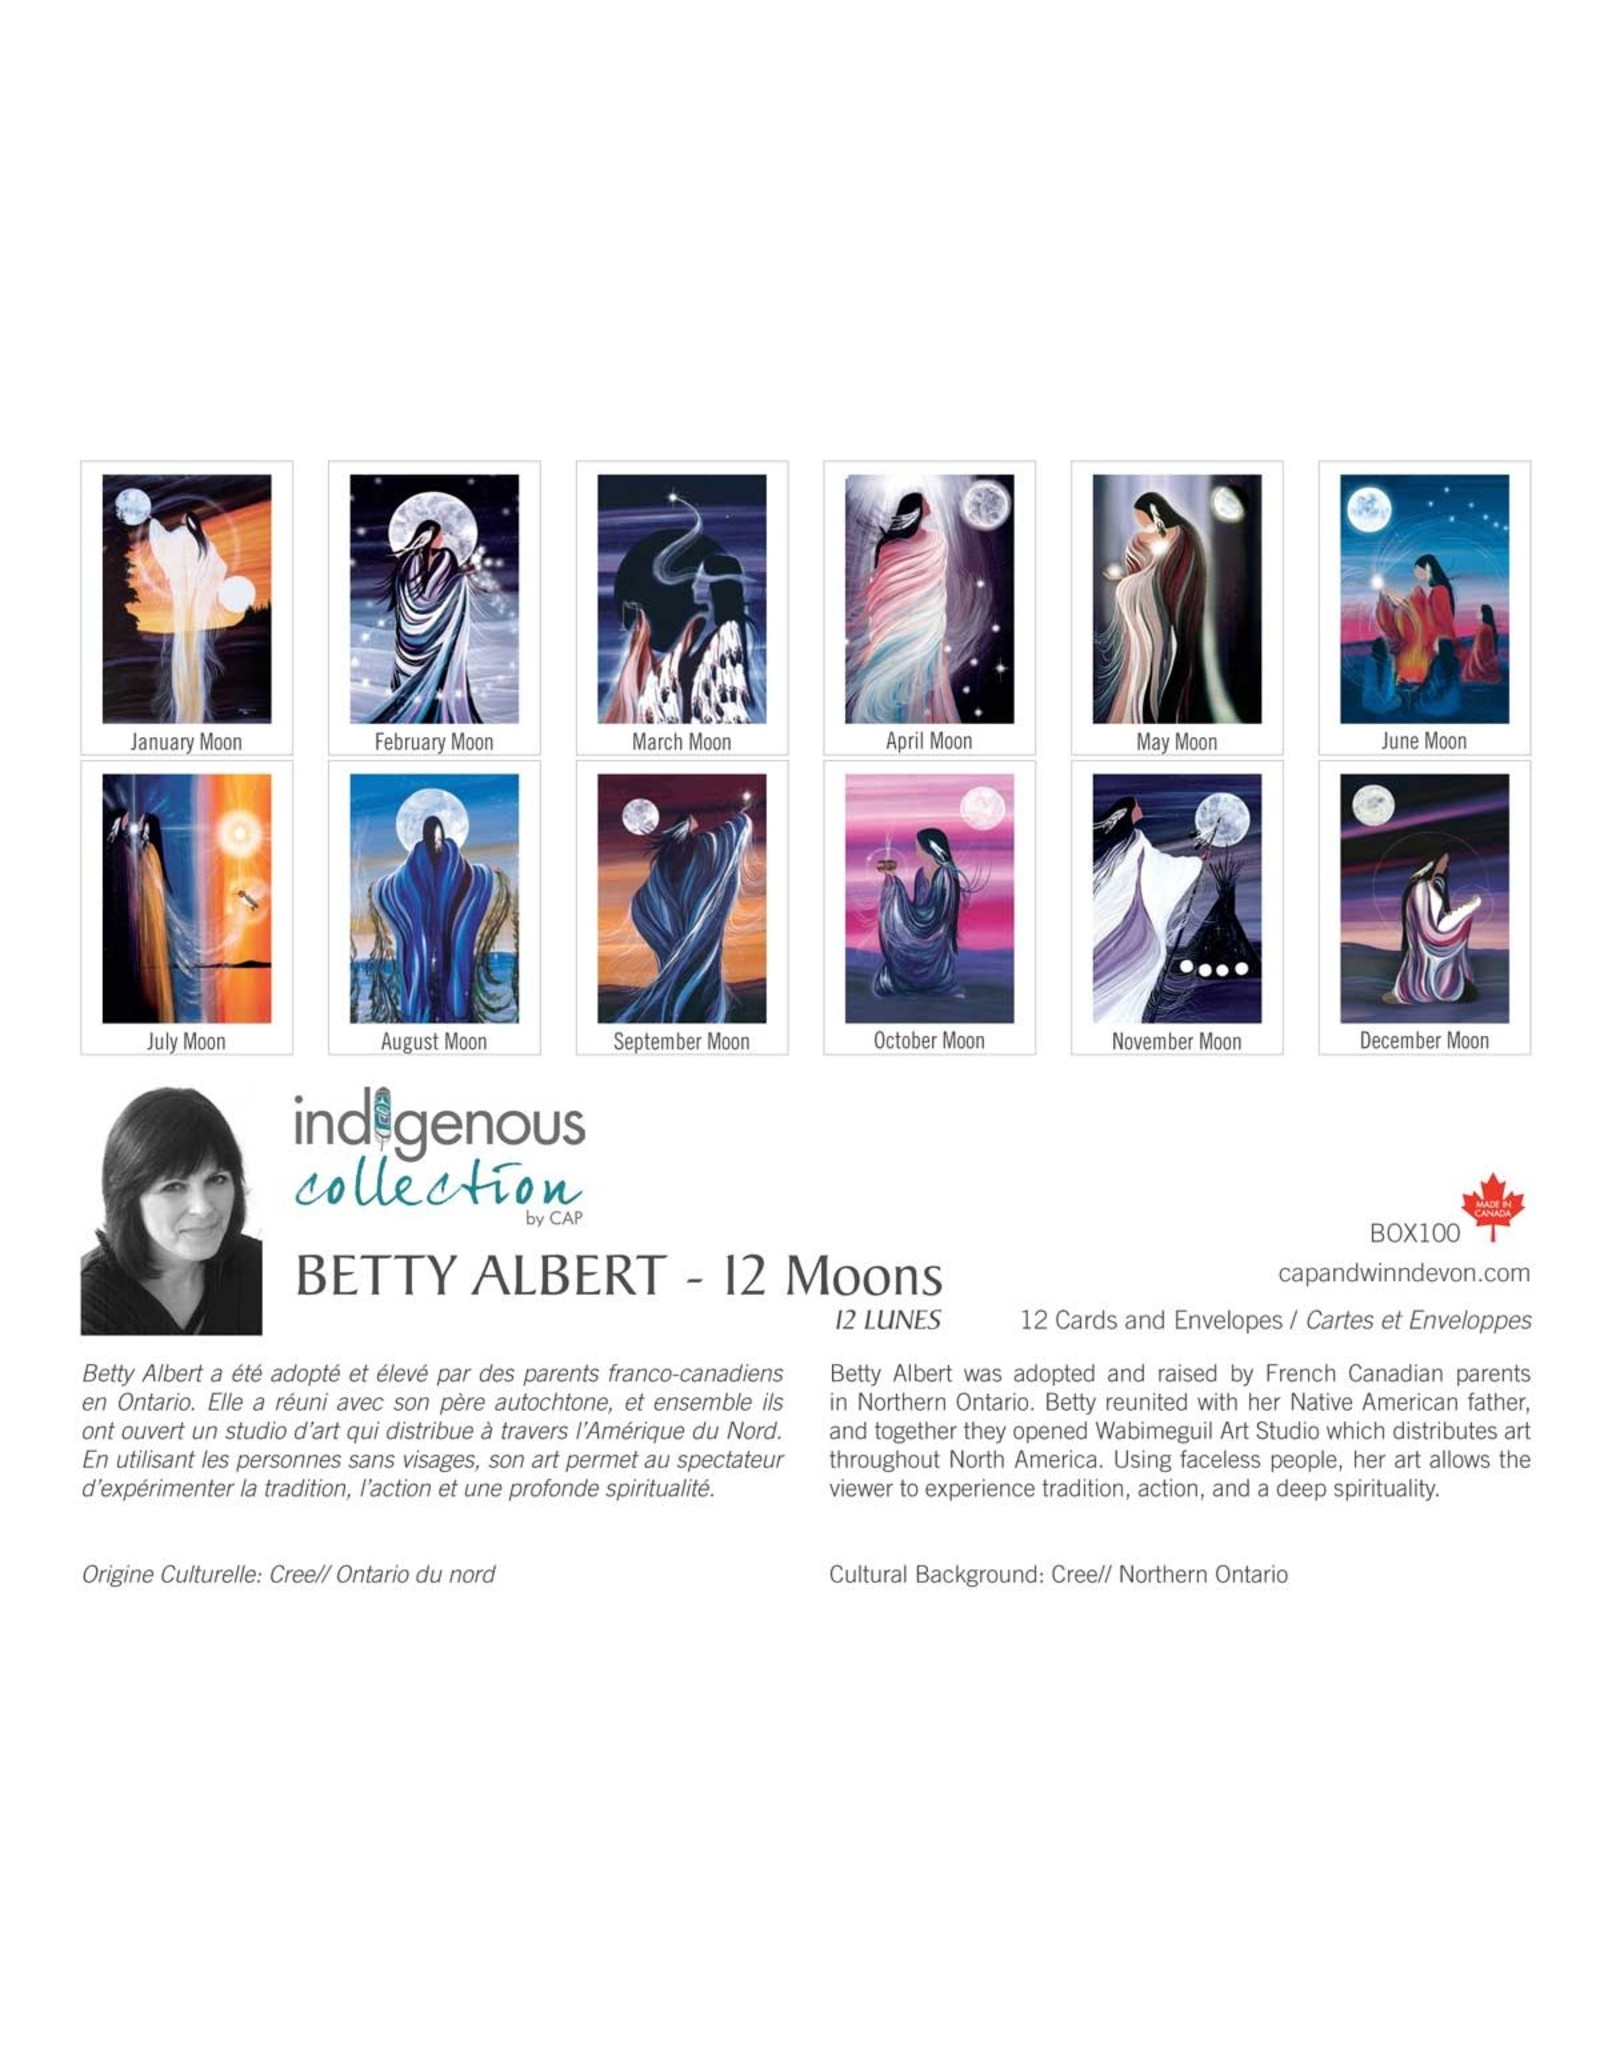 12 Moons by Betty Albert 12 Card Box - Box 100